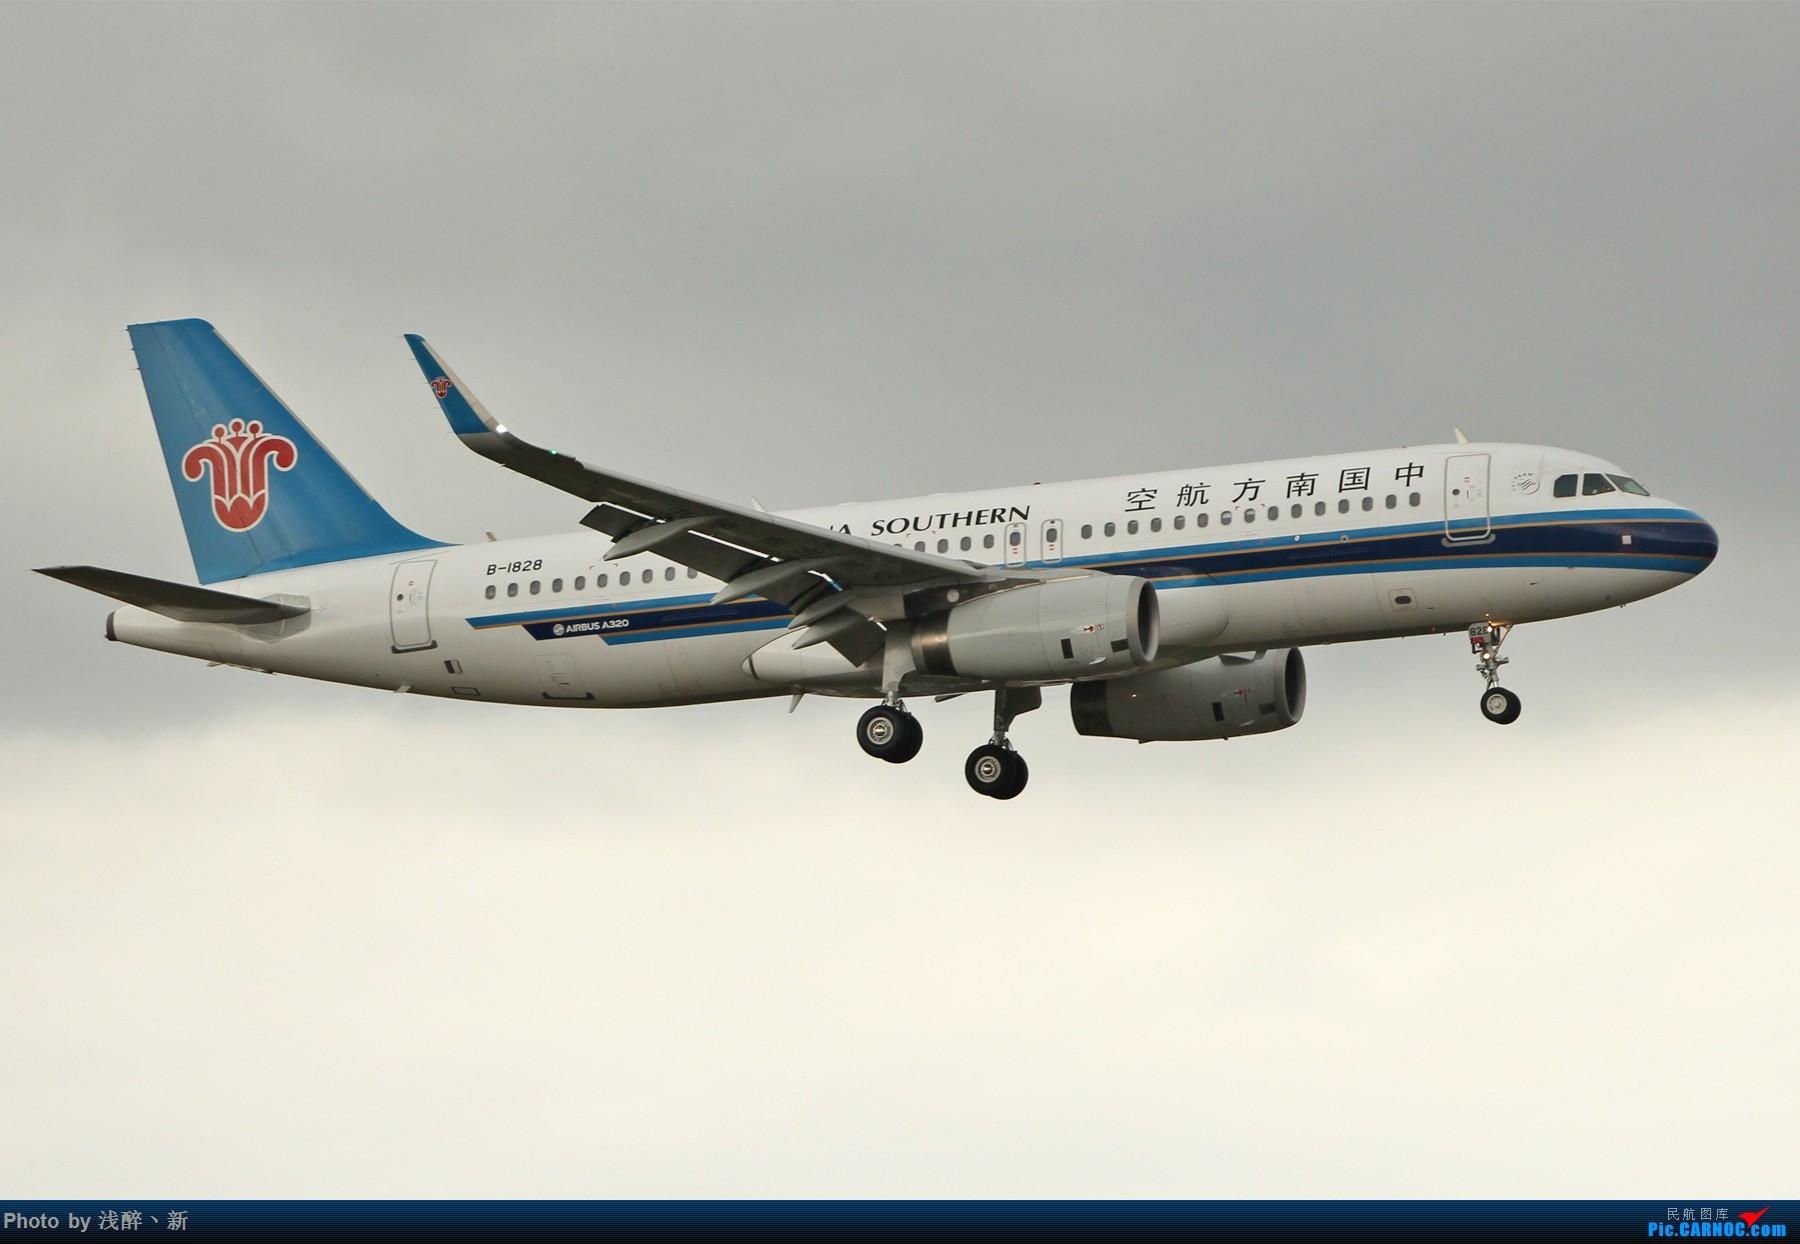 Re:[原创]DLC 7.16 机场游击战 AIRBUS A320-200 B-1828 中国大连国际机场